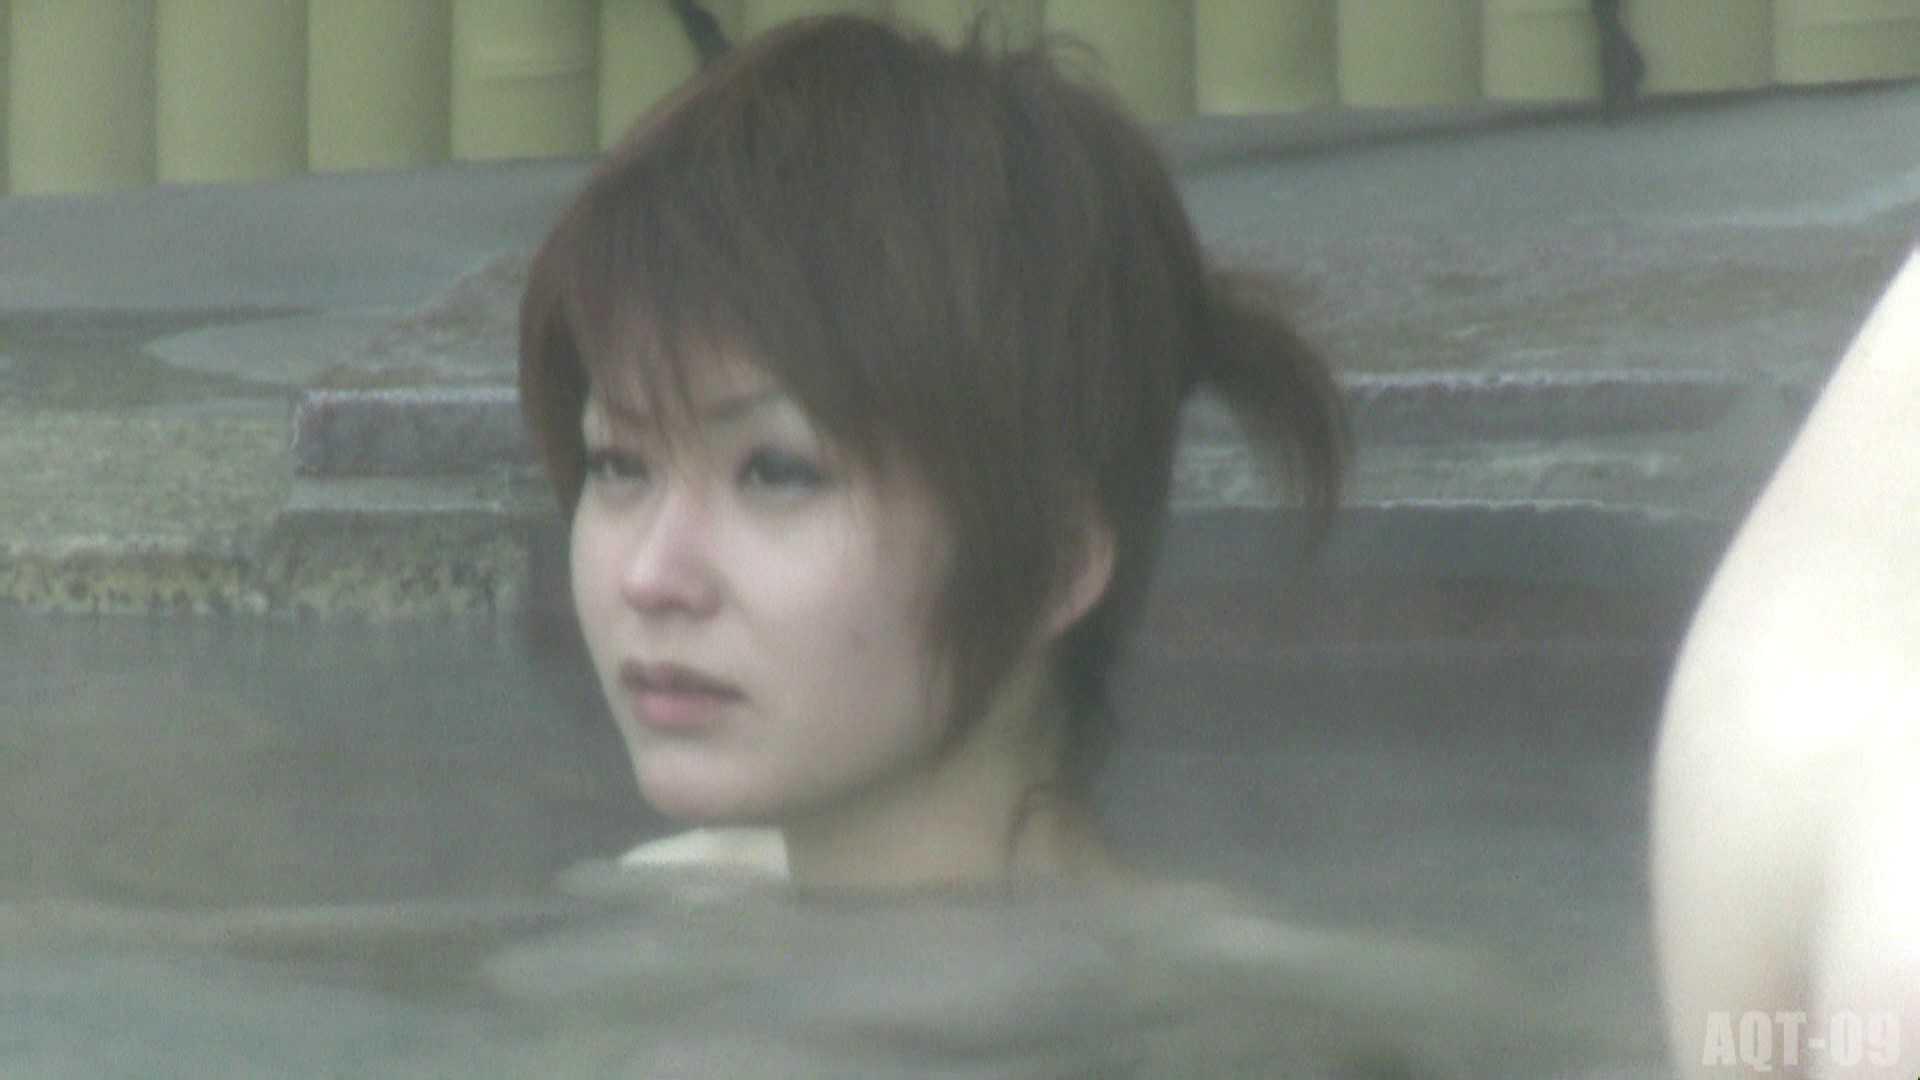 Aquaな露天風呂Vol.779 盗撮 SEX無修正画像 81連発 26